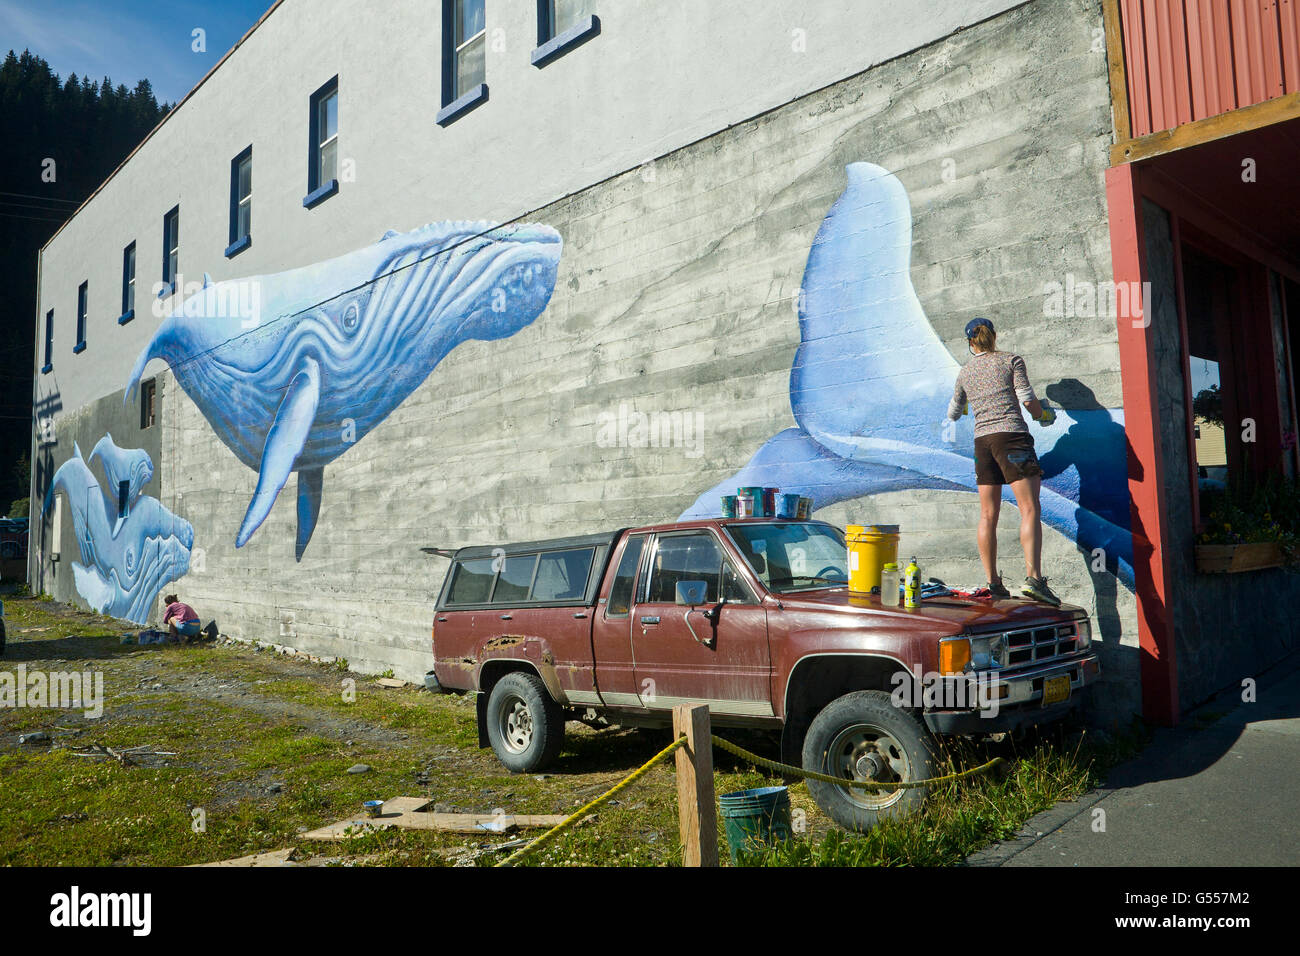 Artist Justine Pechuzal painting her mural 'Sea-ward Bound' depicting  humpback whales (Megaptera novaeangliae), - Stock Image